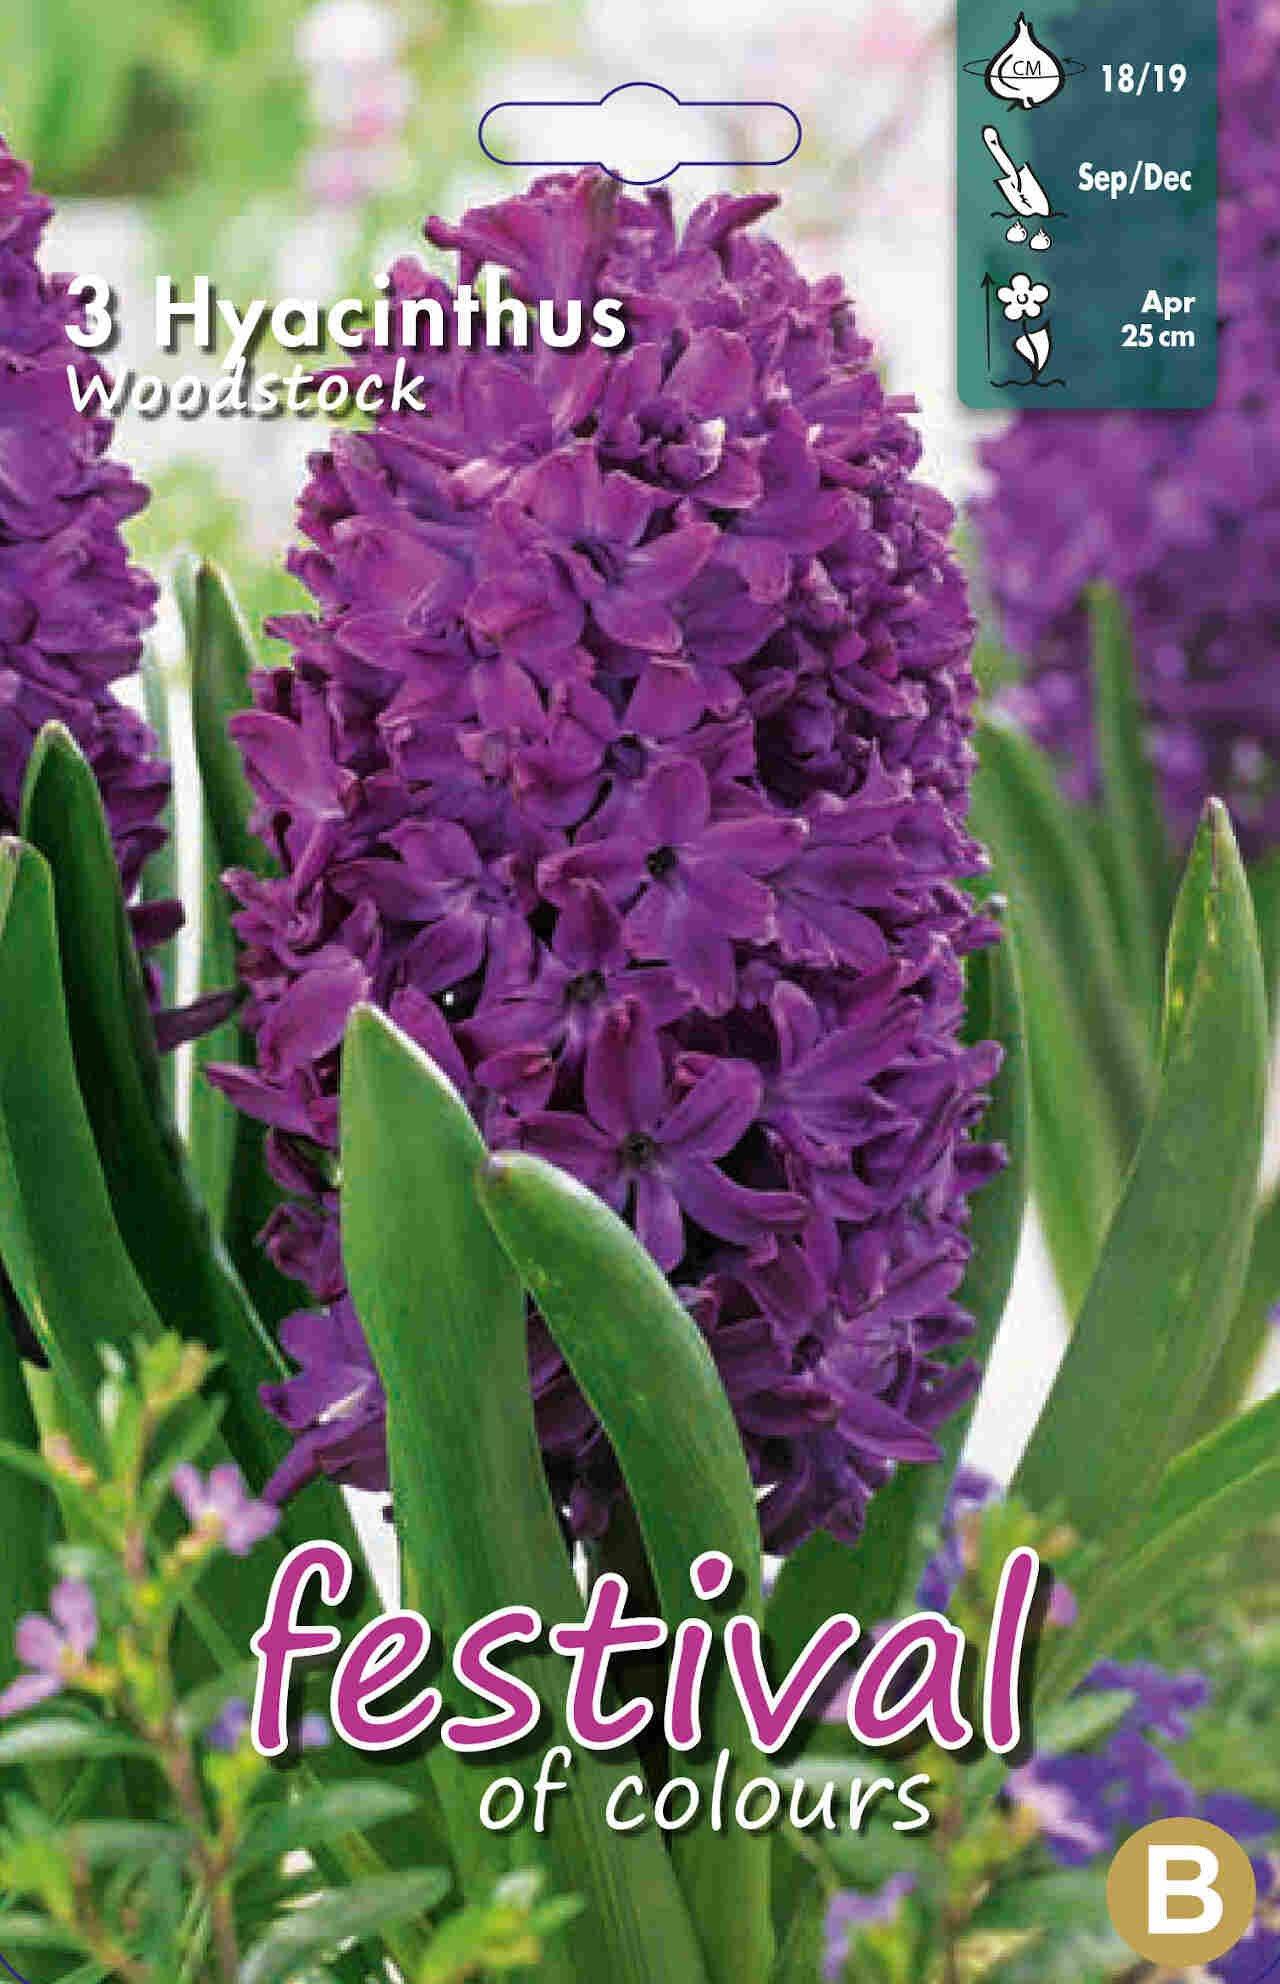 Hyacint - Hyacinths Woodstock 18/19